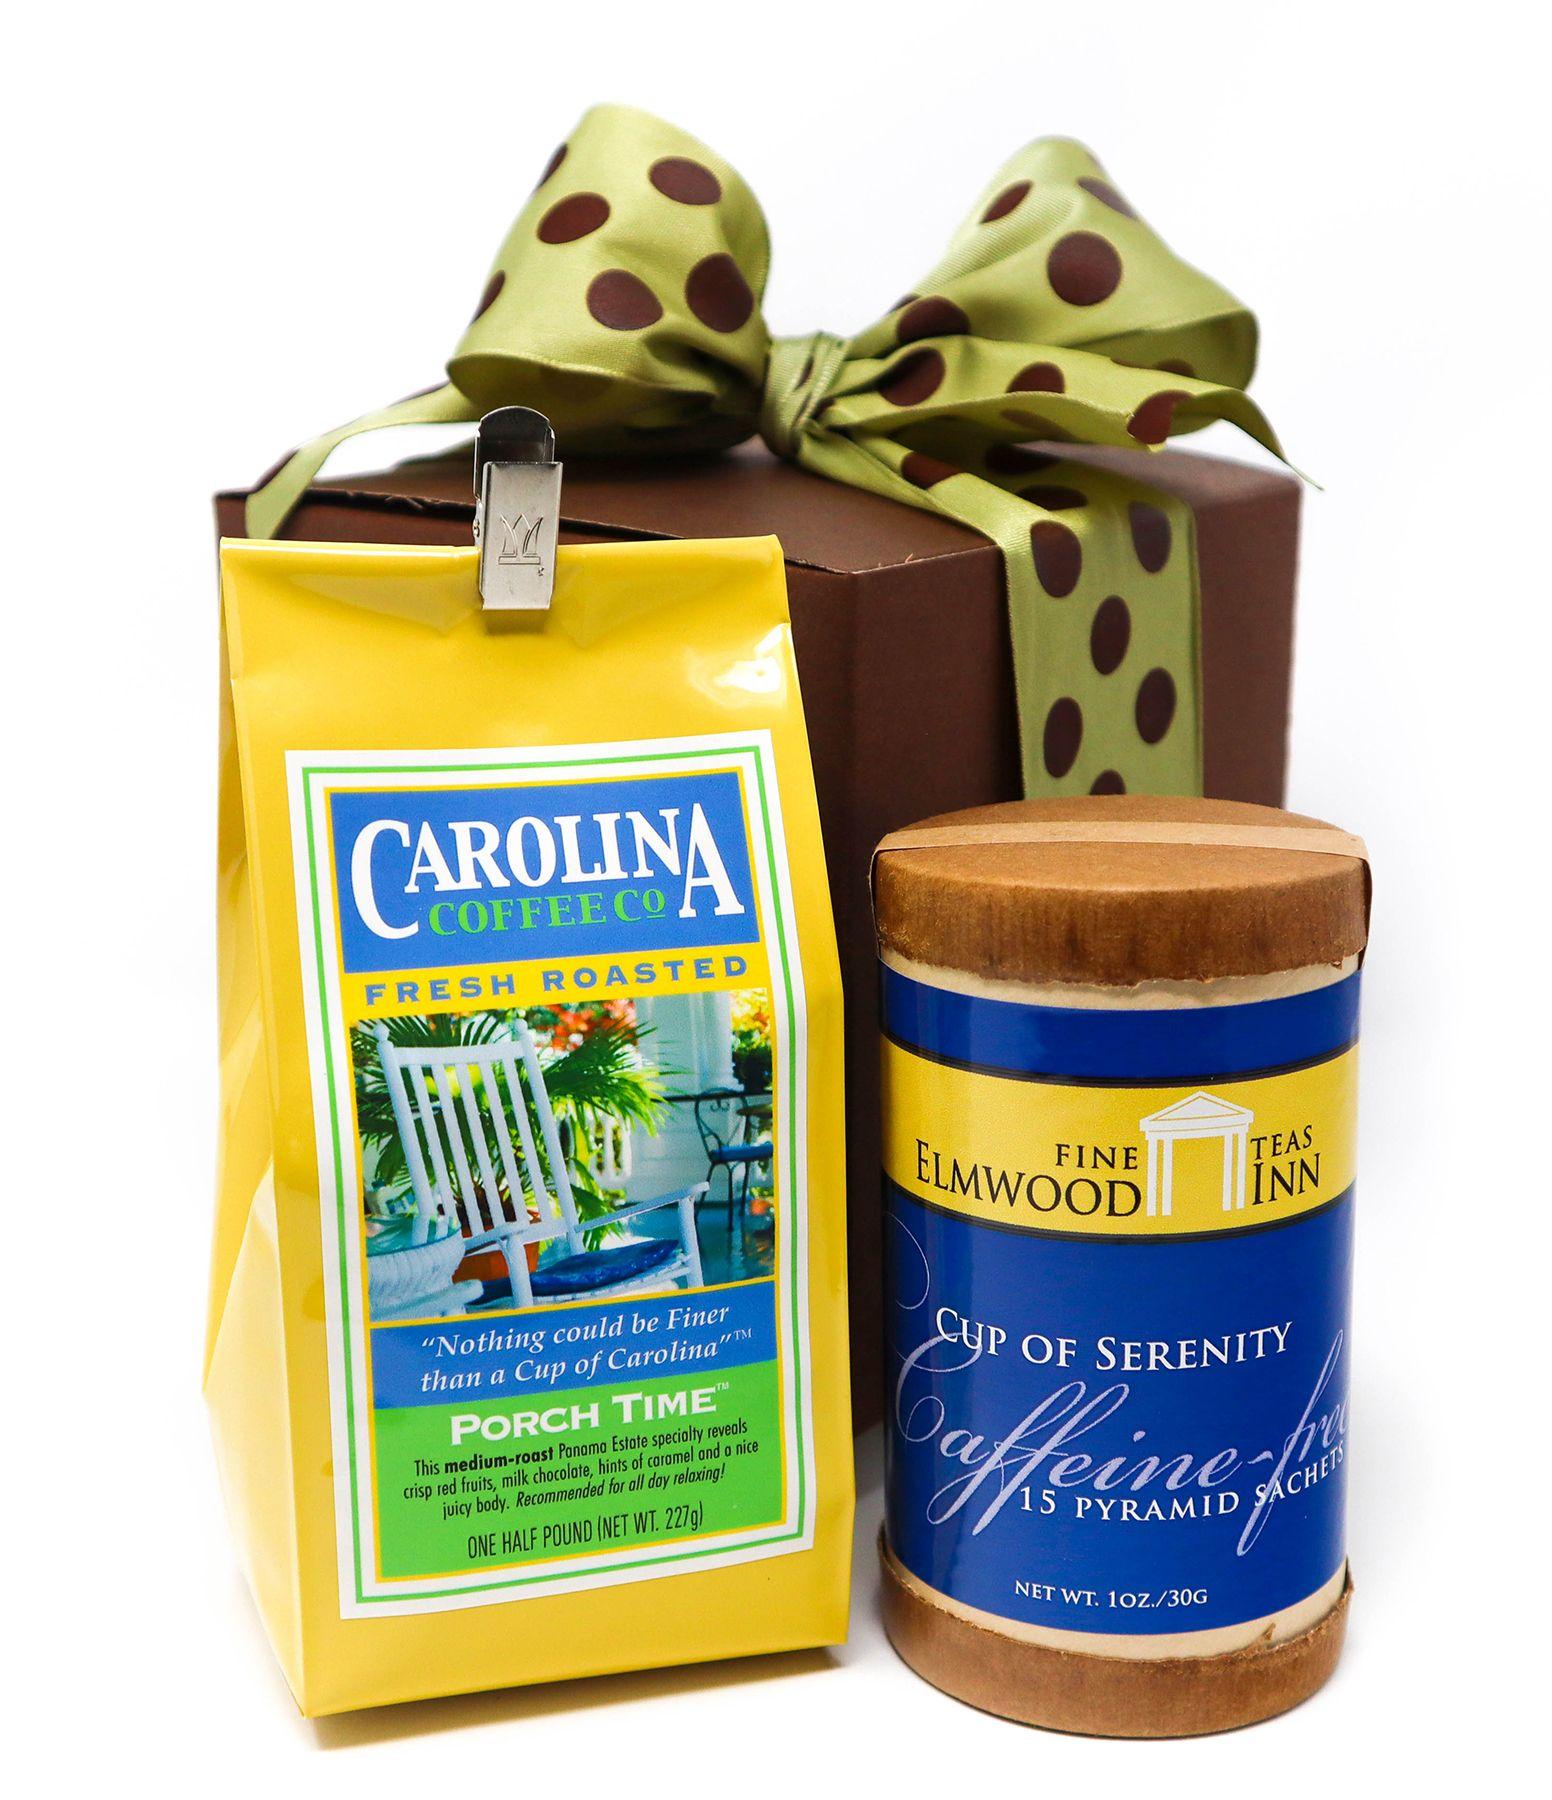 Carolina Coffee Coffee and Tea Gift Box